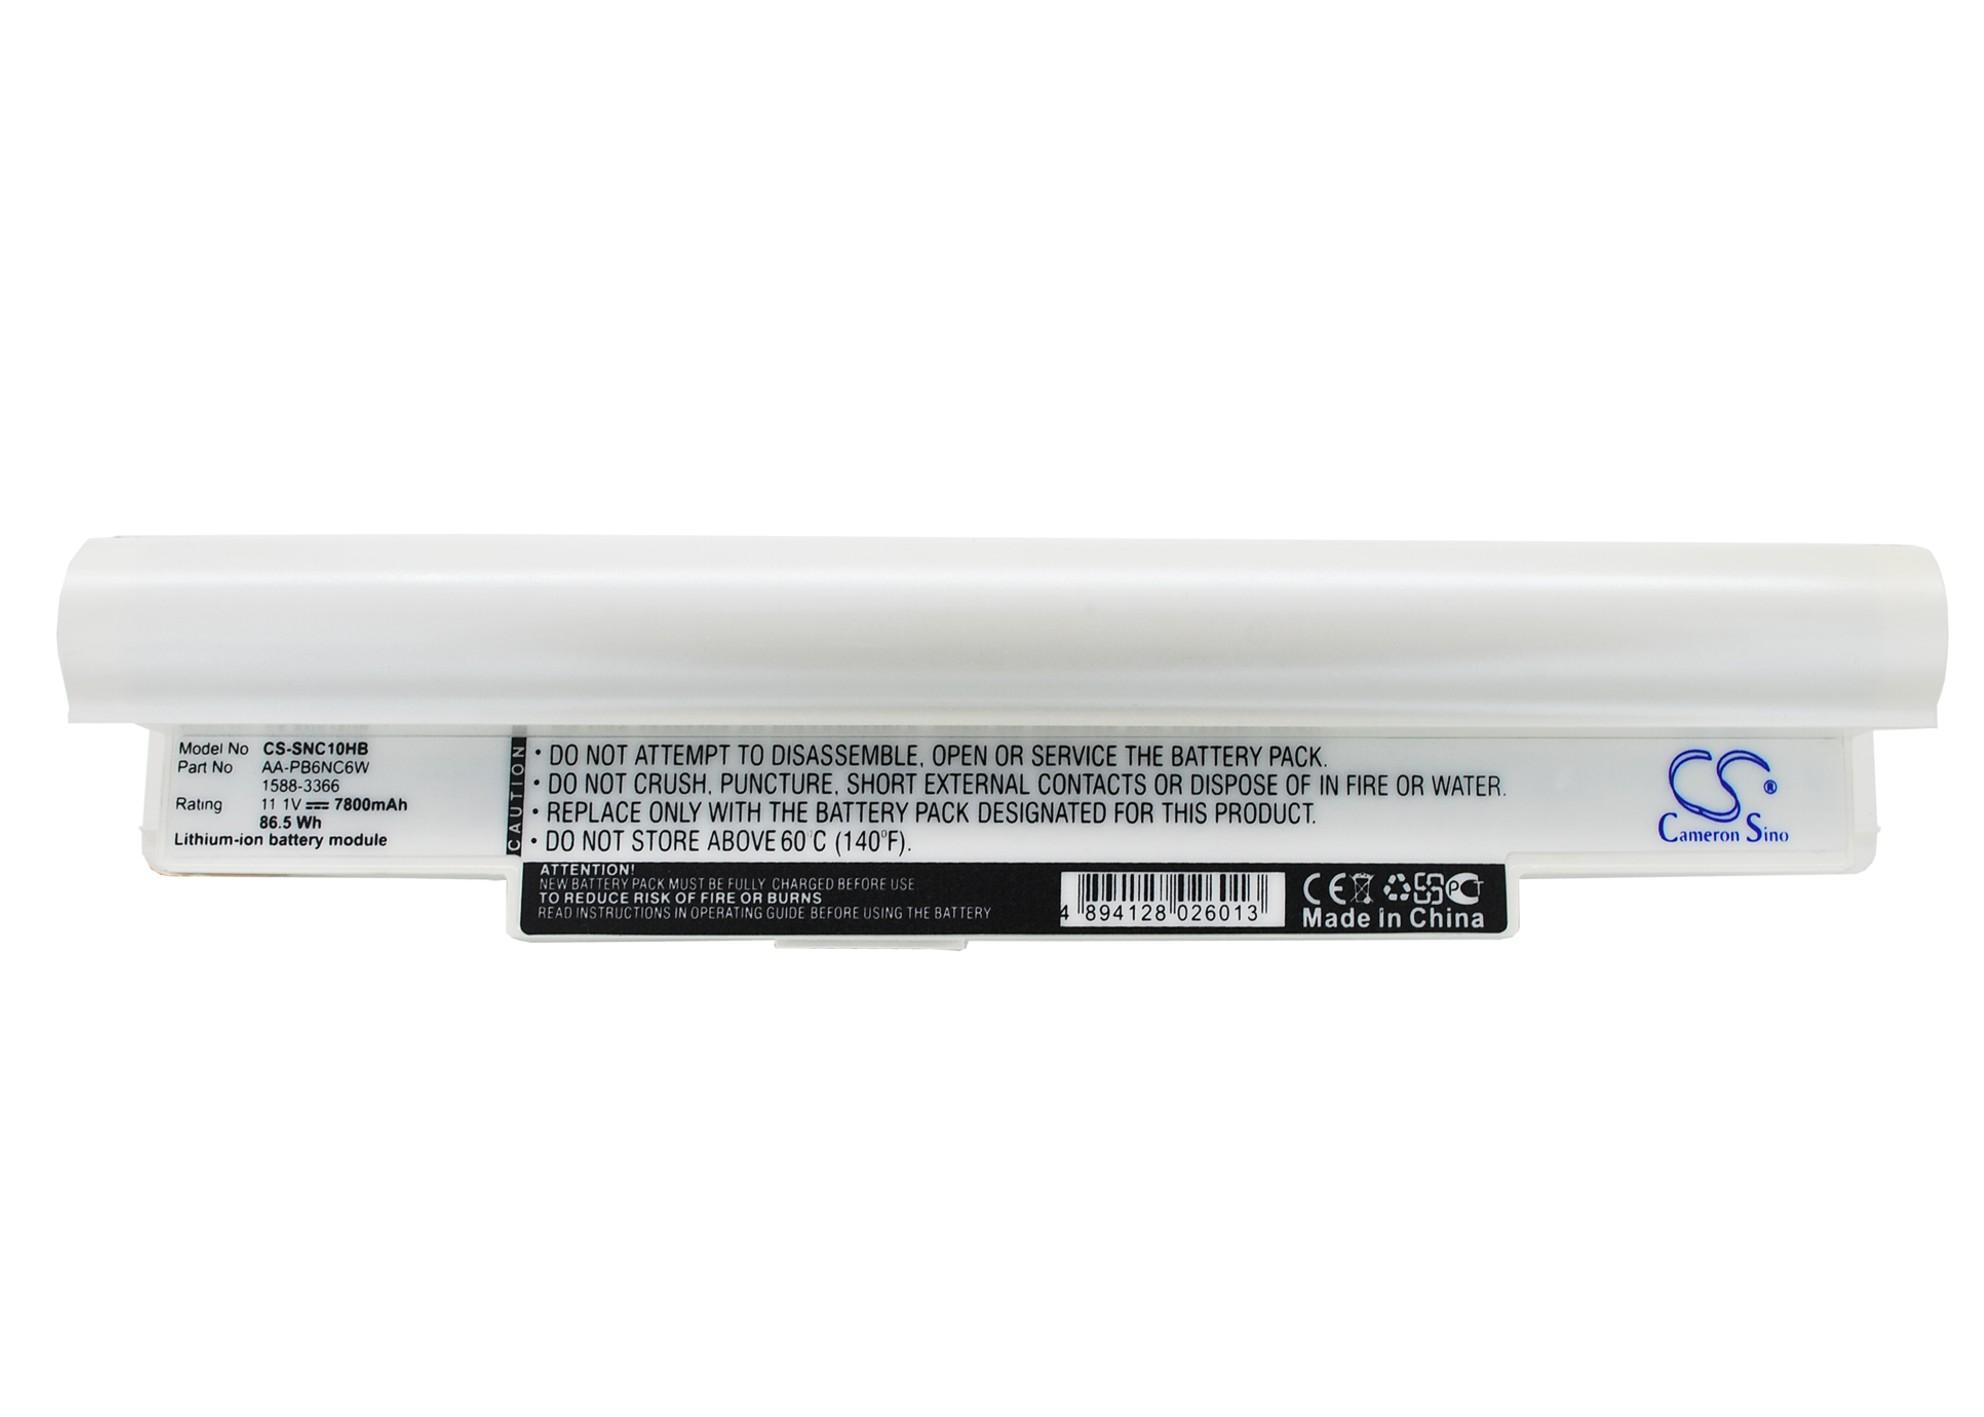 Cameron Sino baterie do notebooků pro SAMSUNG NP-NC20-KA01 11.1V Li-ion 7800mAh bílá - neoriginální